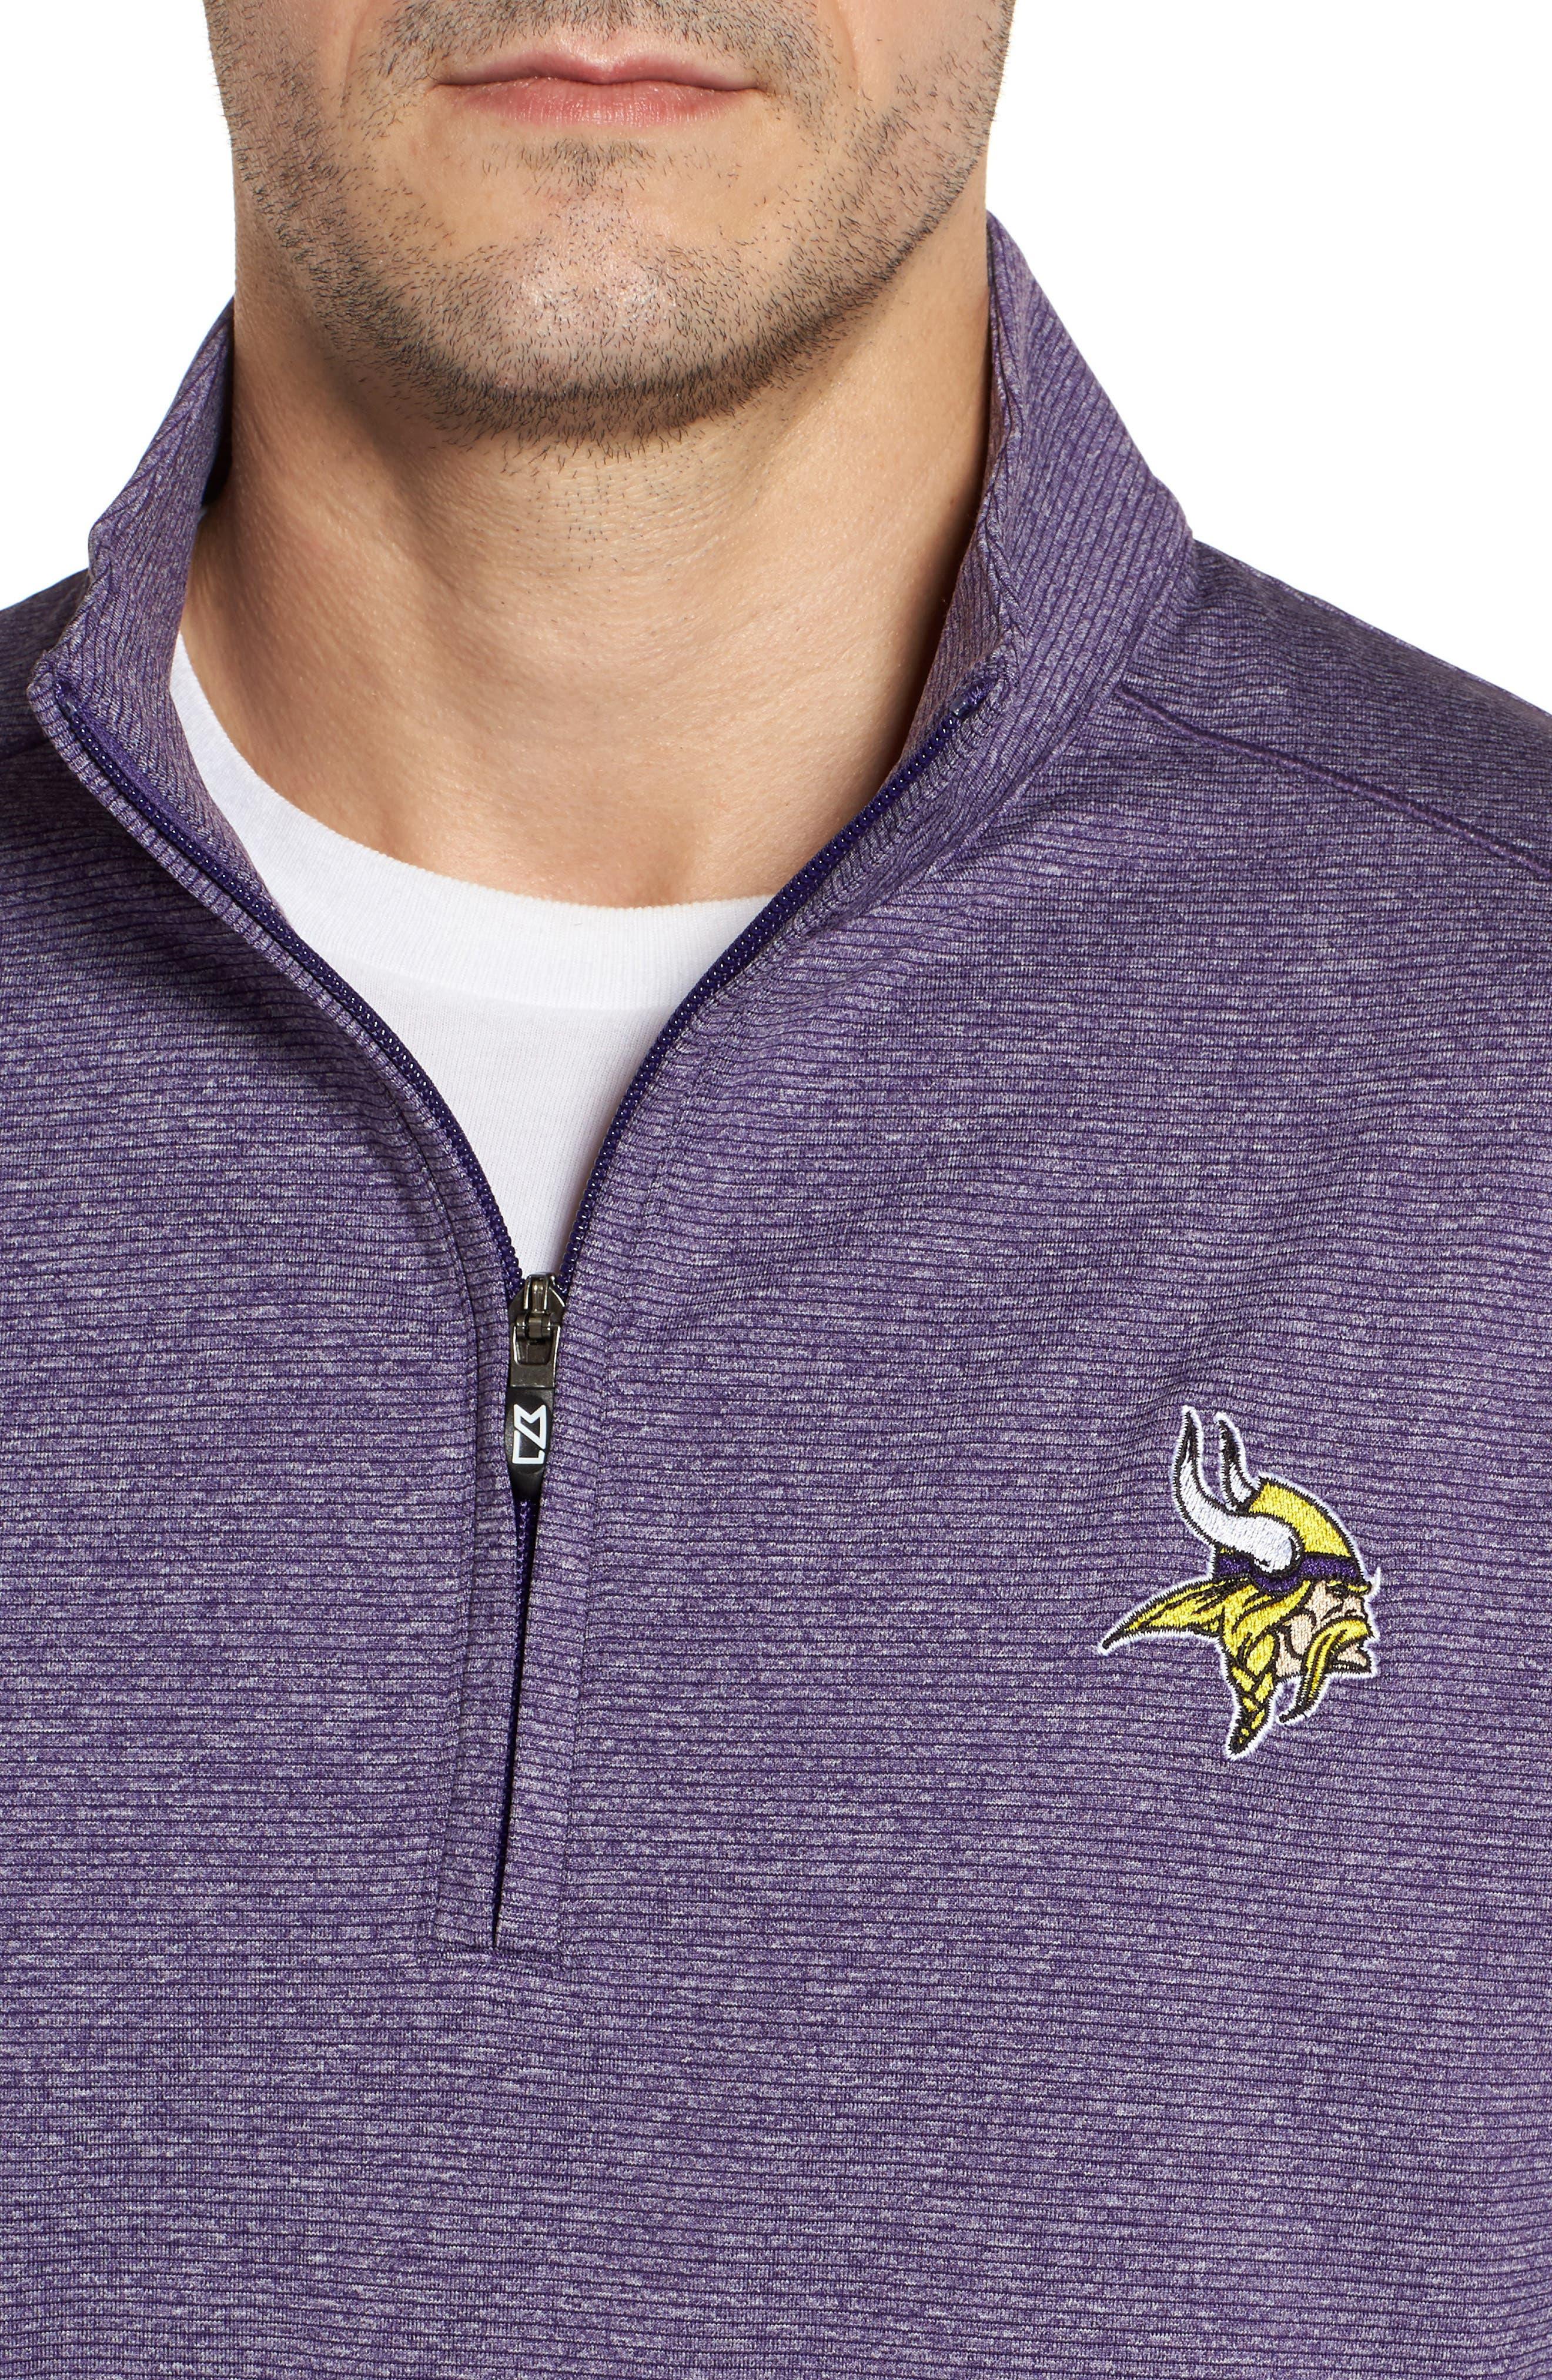 Shoreline - Minnesota Vikings Half Zip Pullover,                             Alternate thumbnail 4, color,                             College Purple Heather